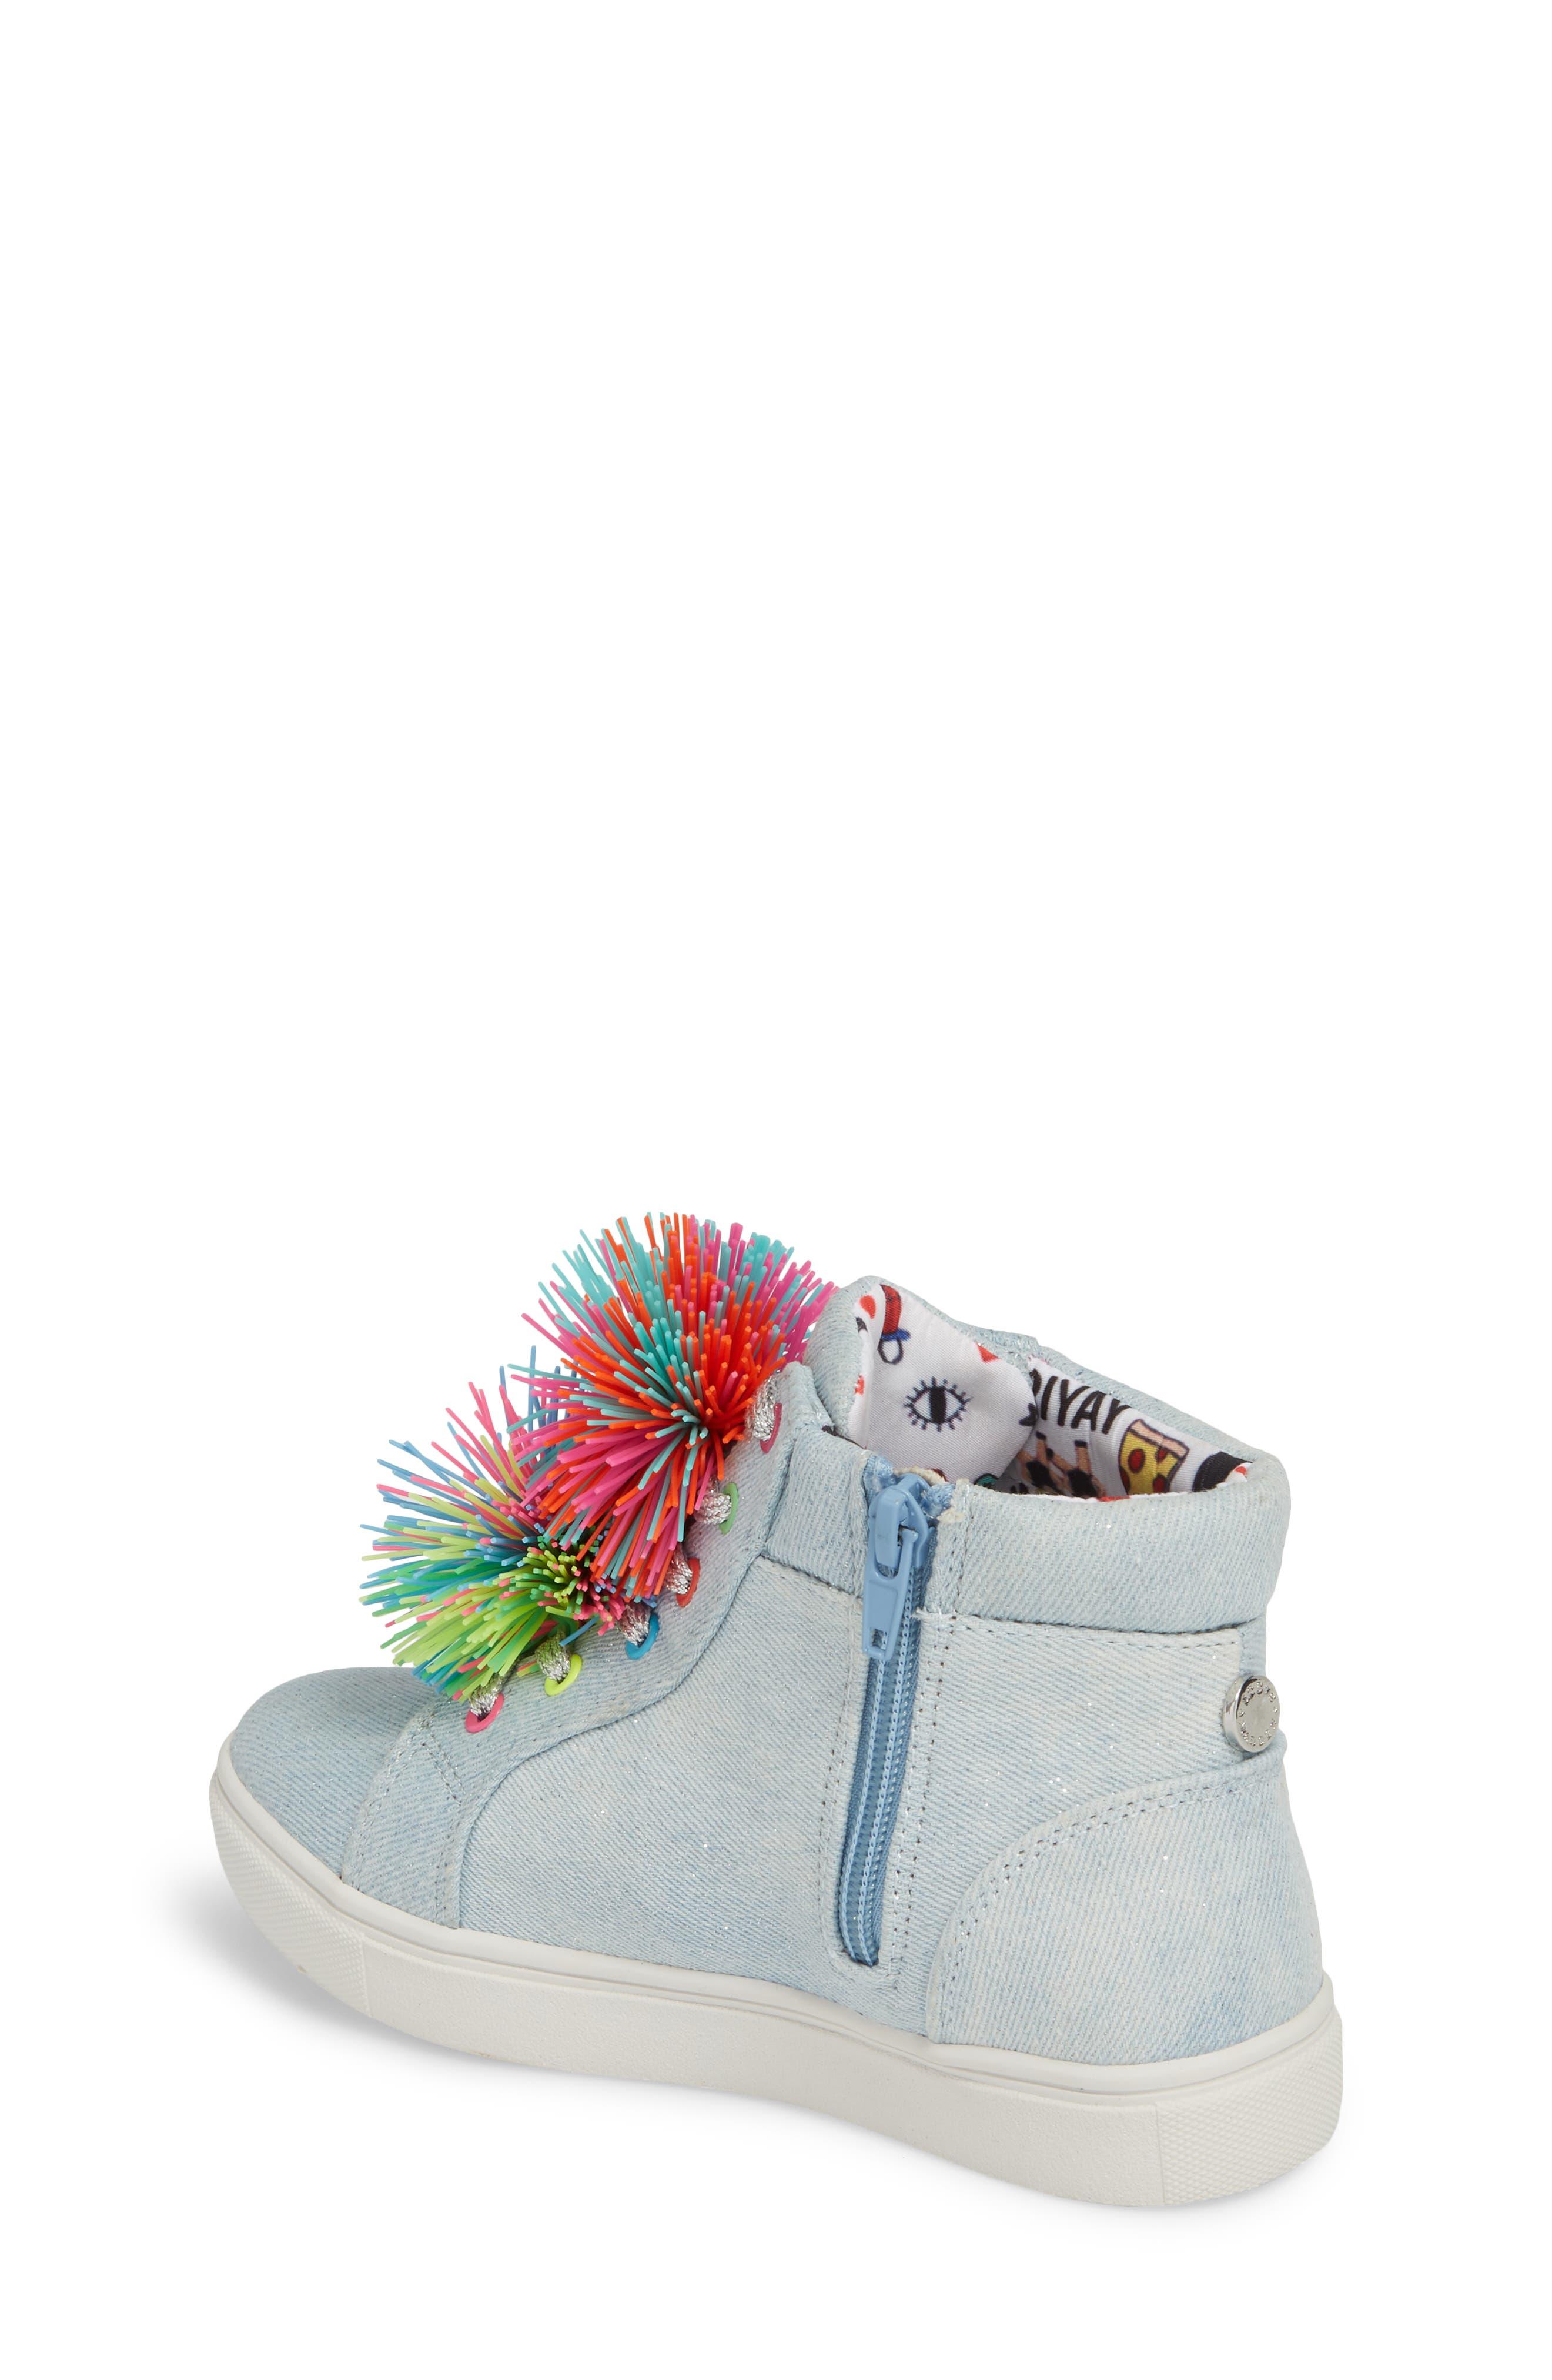 JBrendie Pompom High Top Sneaker,                             Alternate thumbnail 2, color,                             Denim